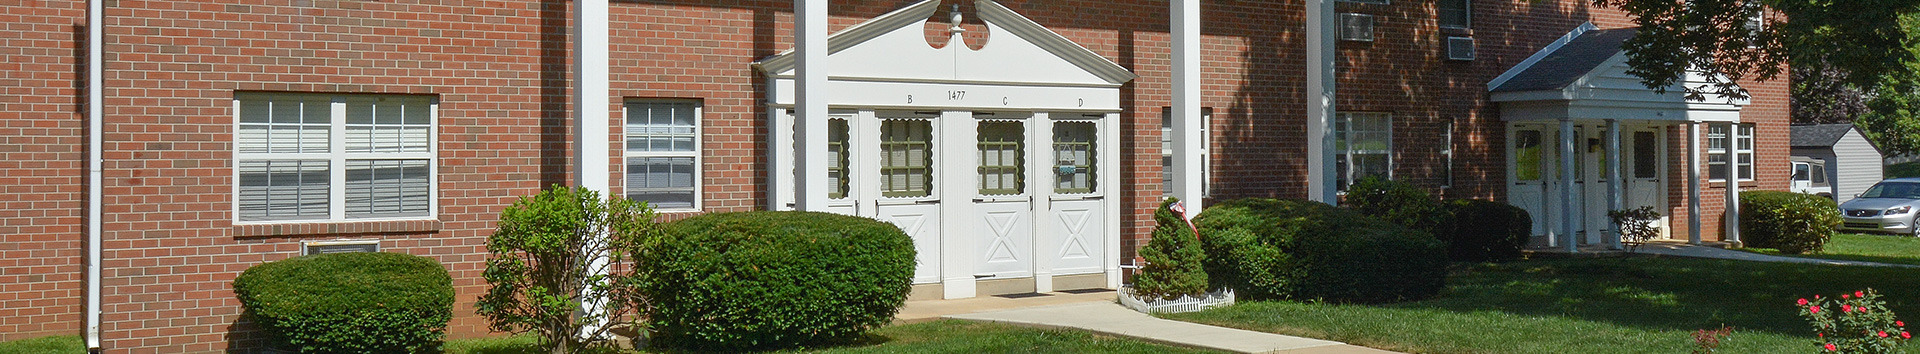 Building view of Manor House Apartments at Manor Communities, Williamsport/Pennsylvania